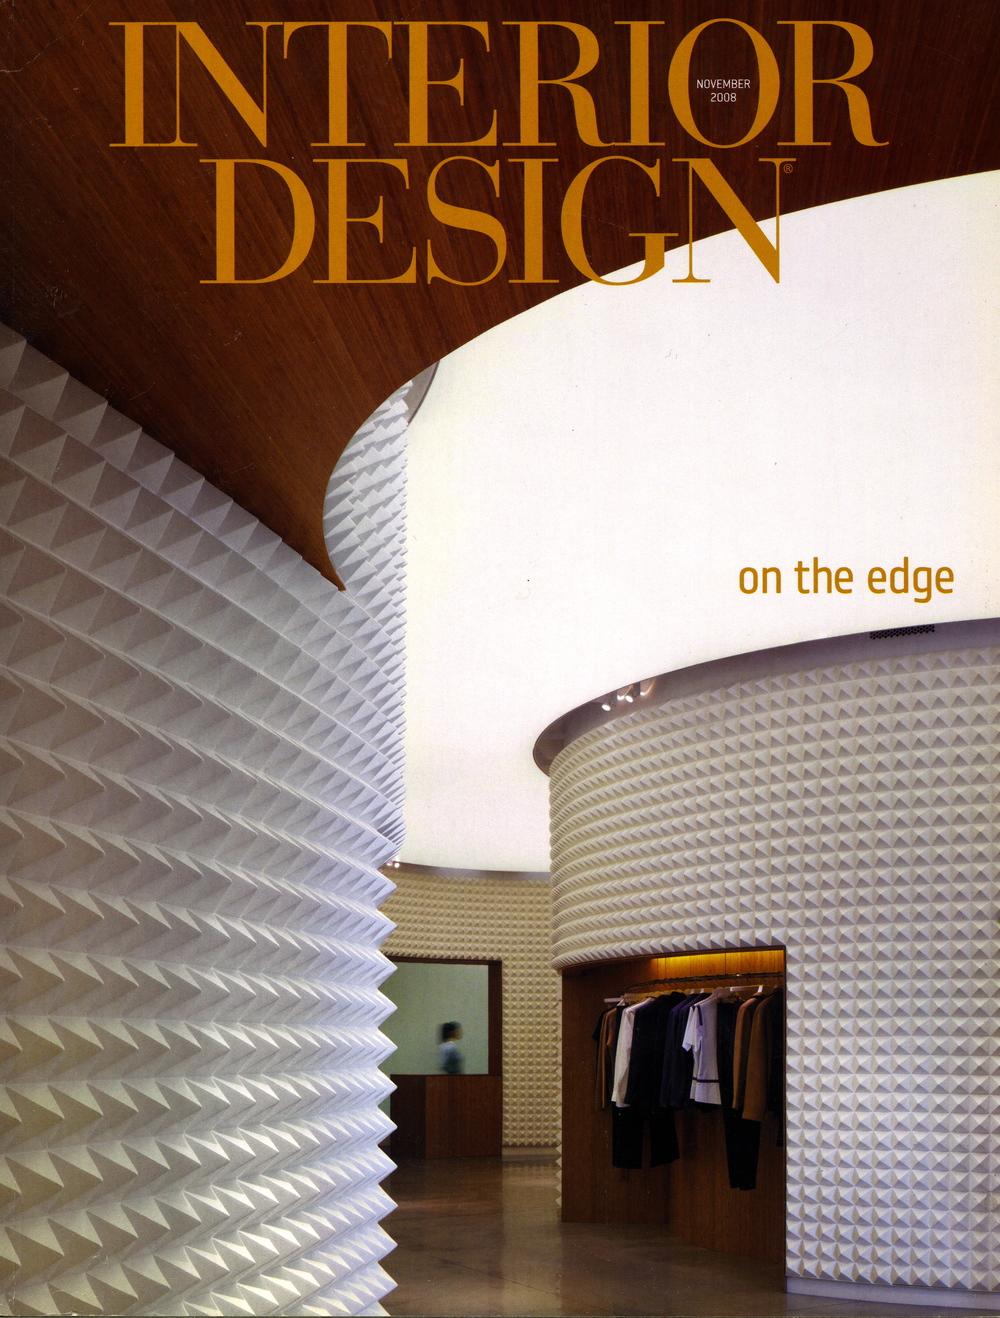 Interior Design Magazine_Nov 2008_cover.jpg